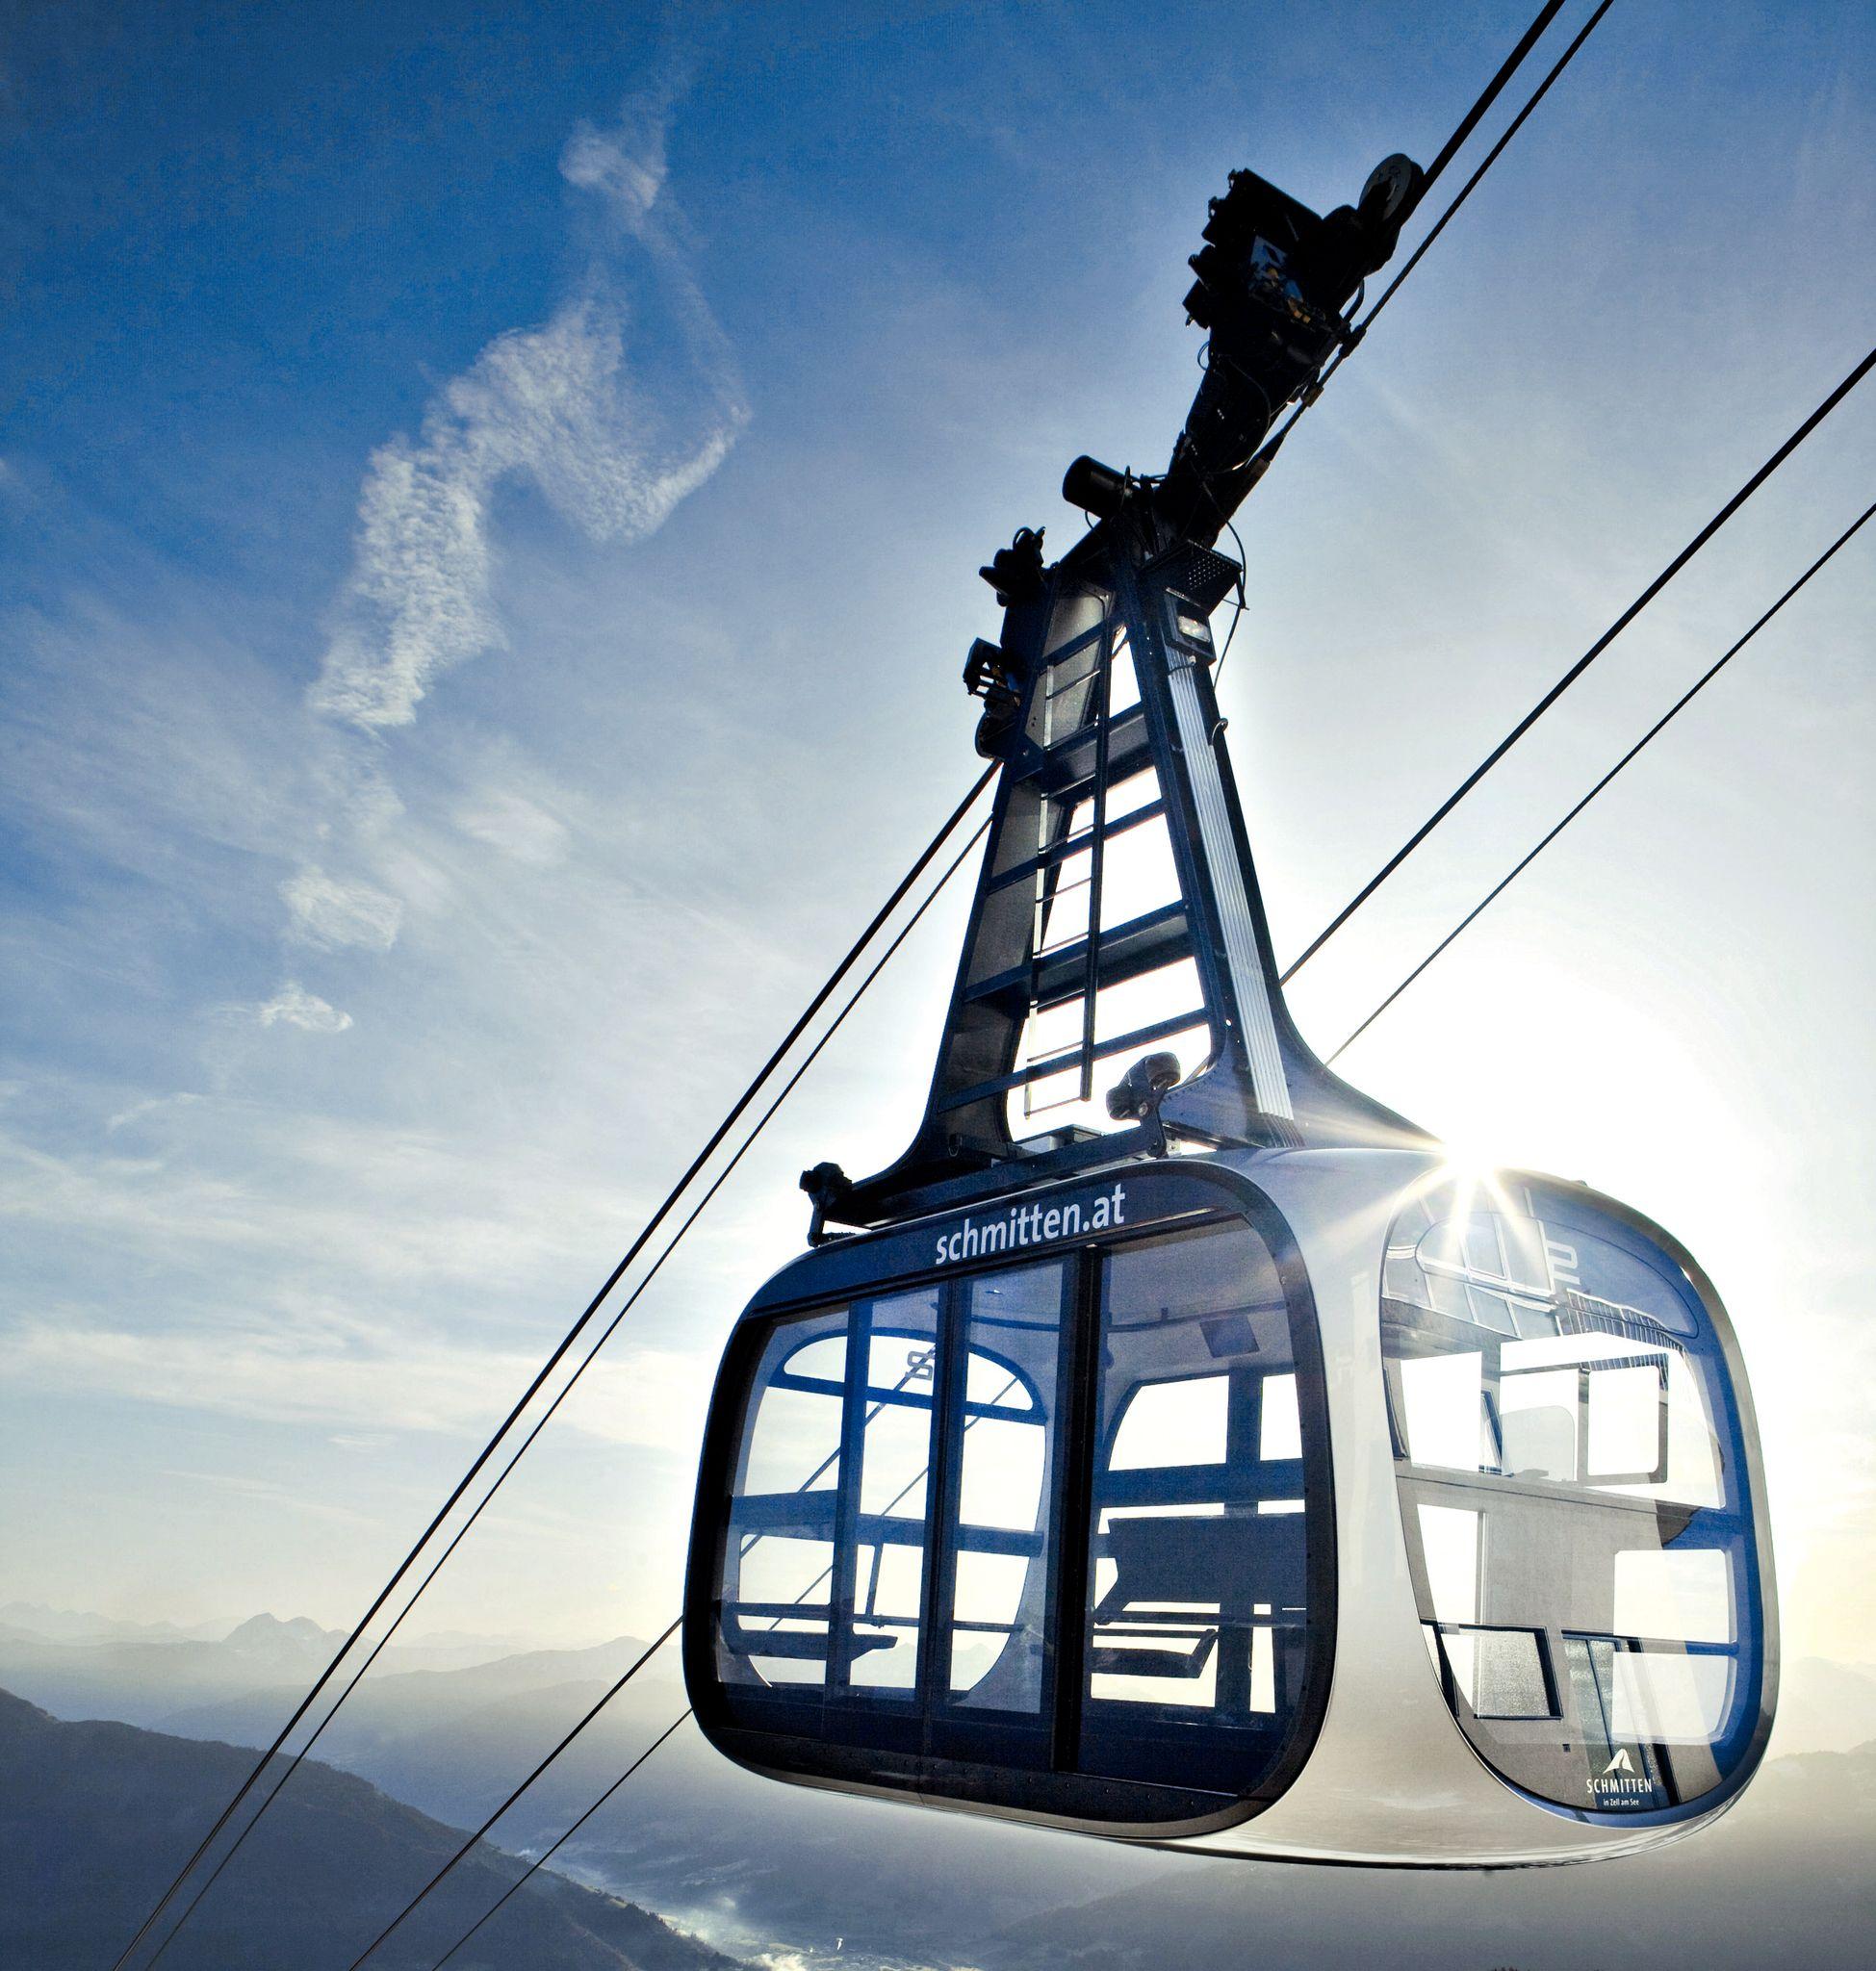 Thomas Cook Holidays Skiing Ski Holidays Ski Lift